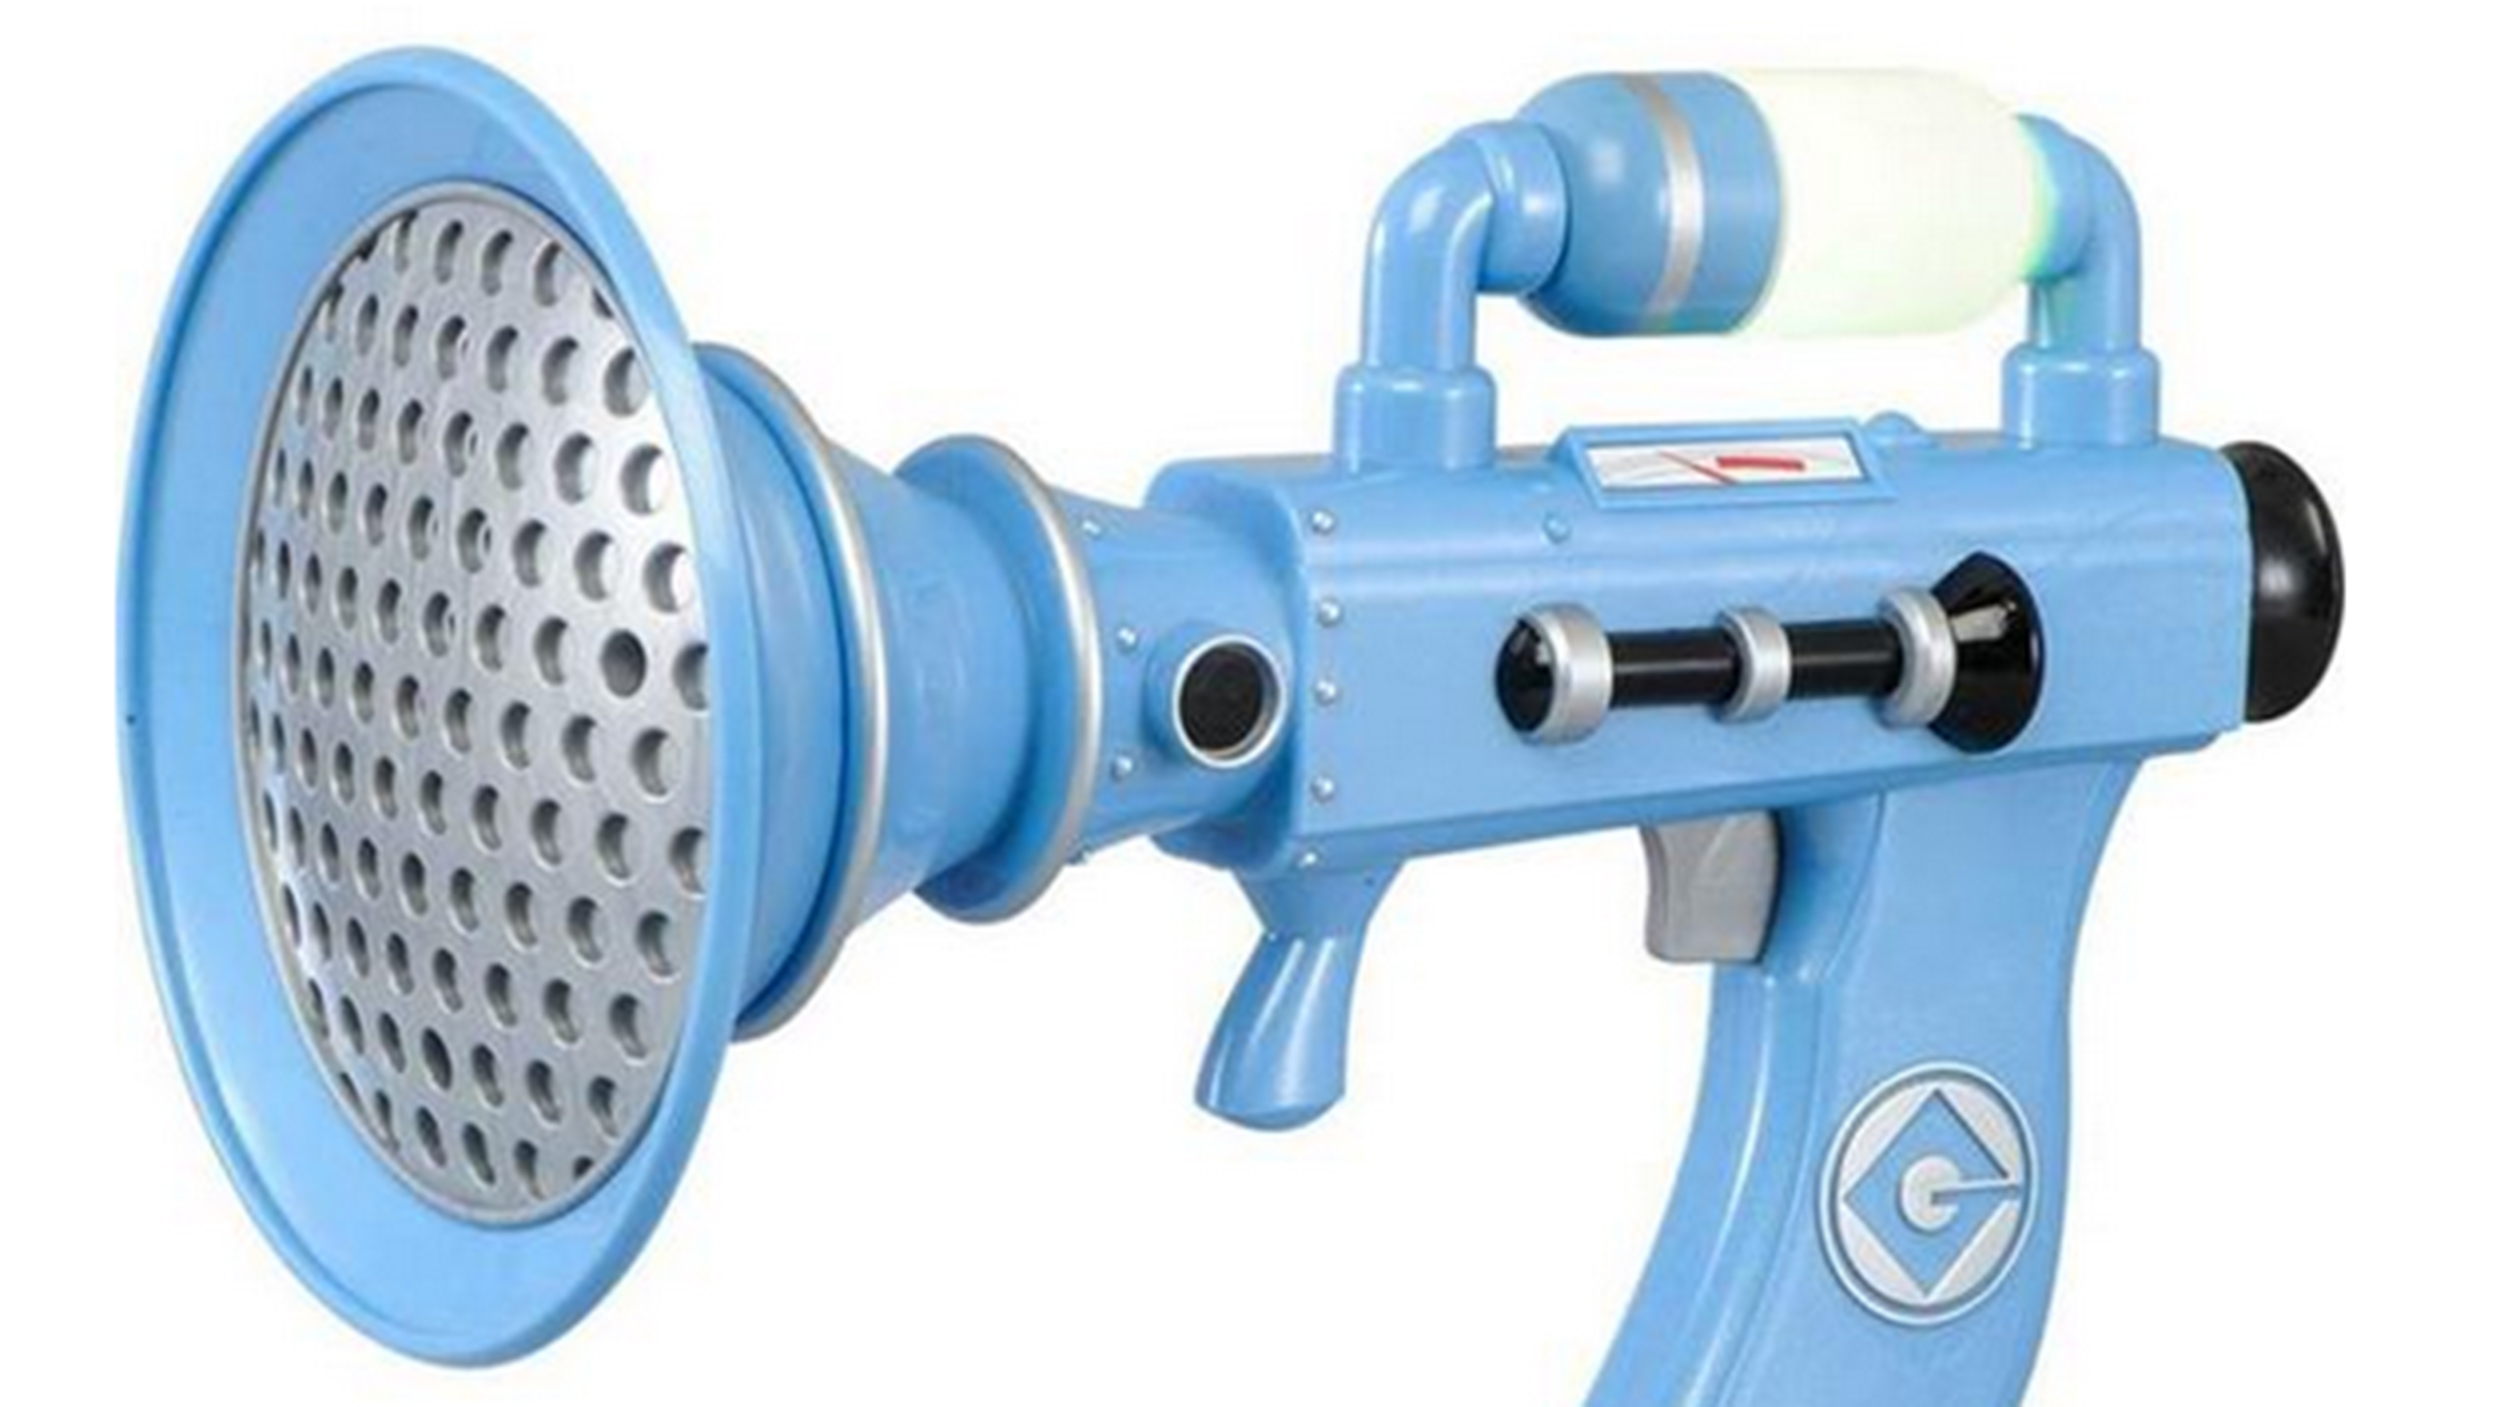 Airport Confiscates Child S Minions Fart Blaster Gun